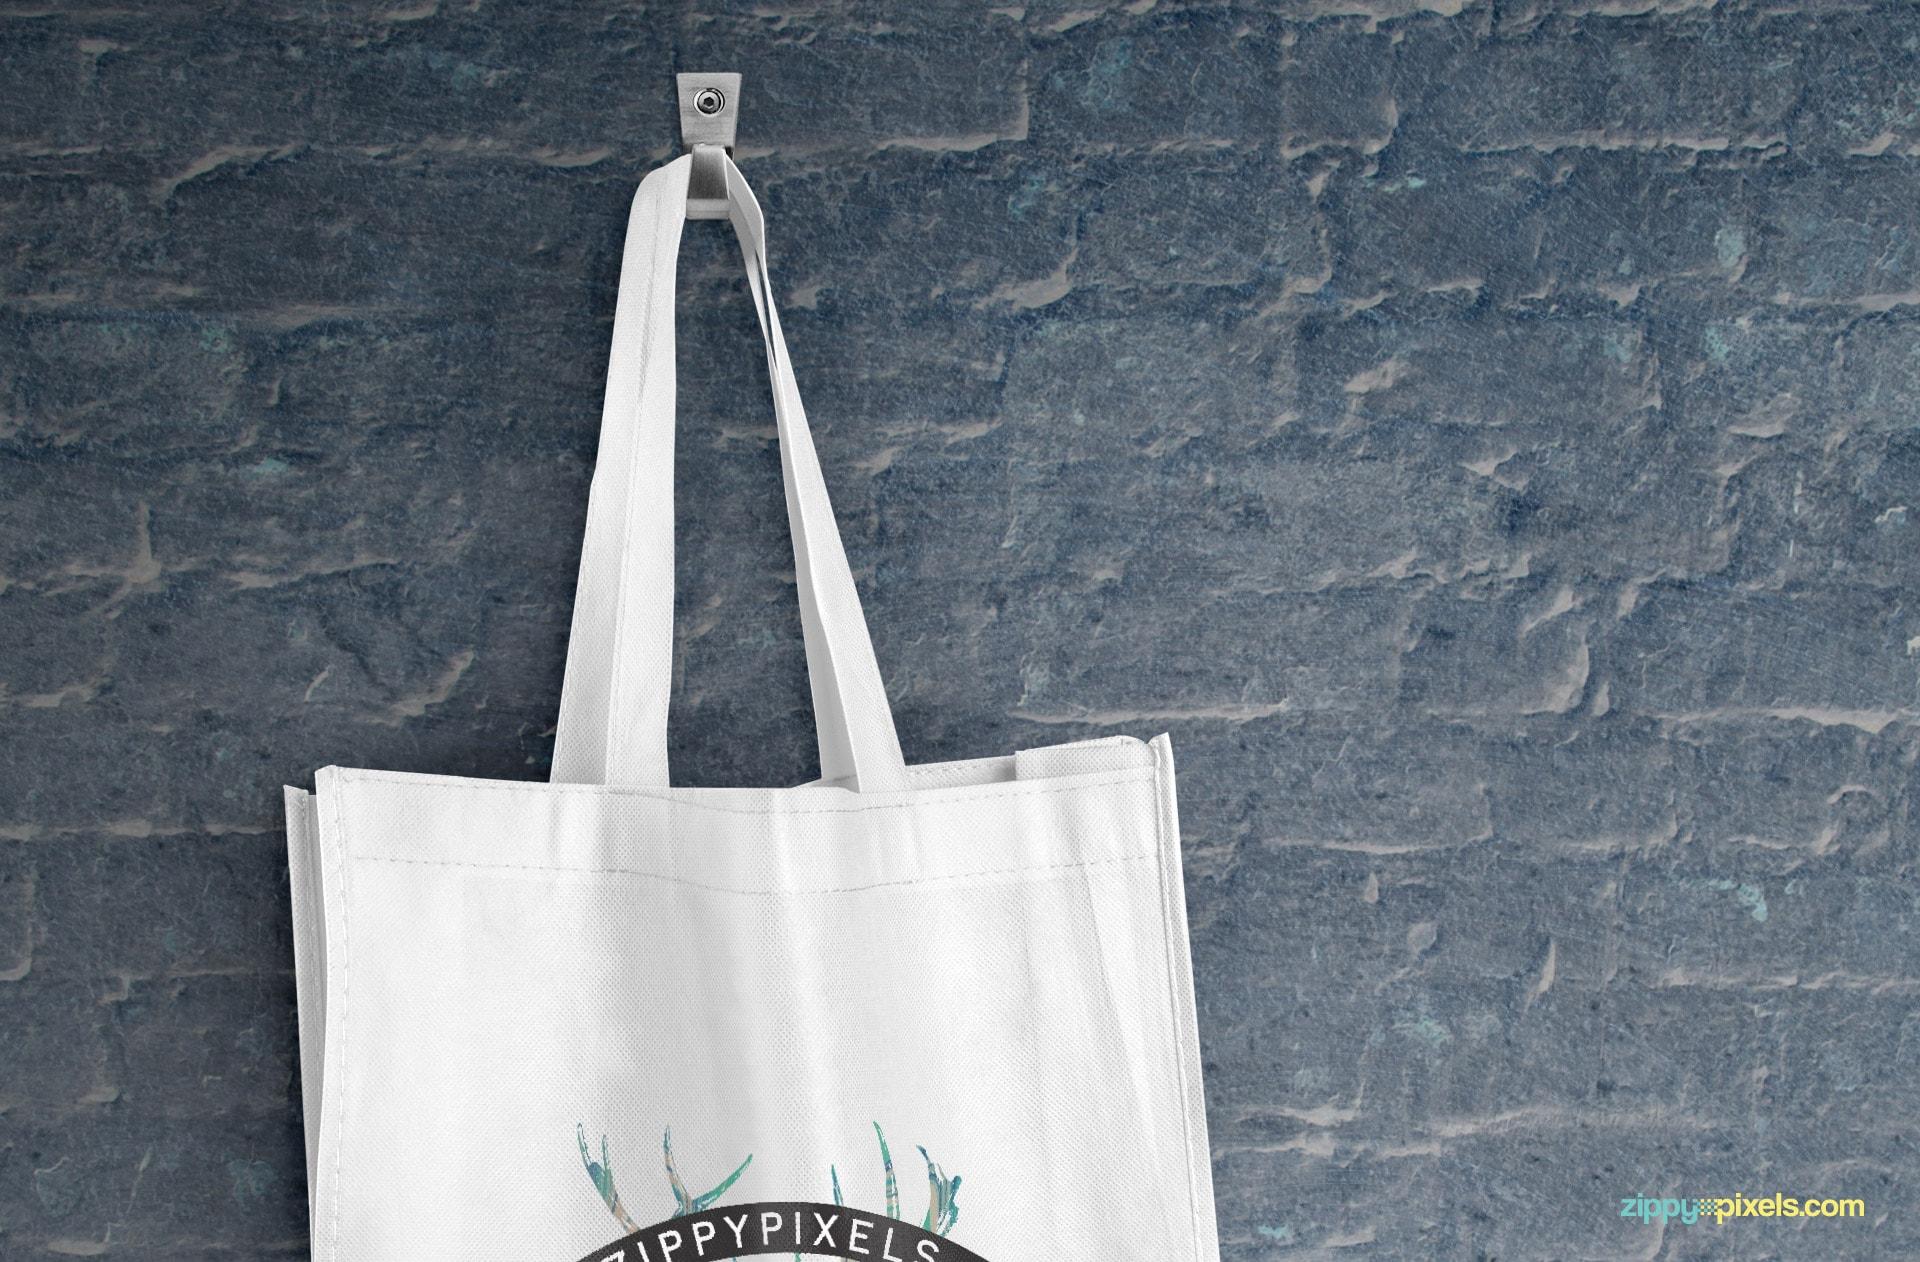 Download canvas tote bag mockup psd. Tote Bag Mockups Free Psd Download Zippypixels